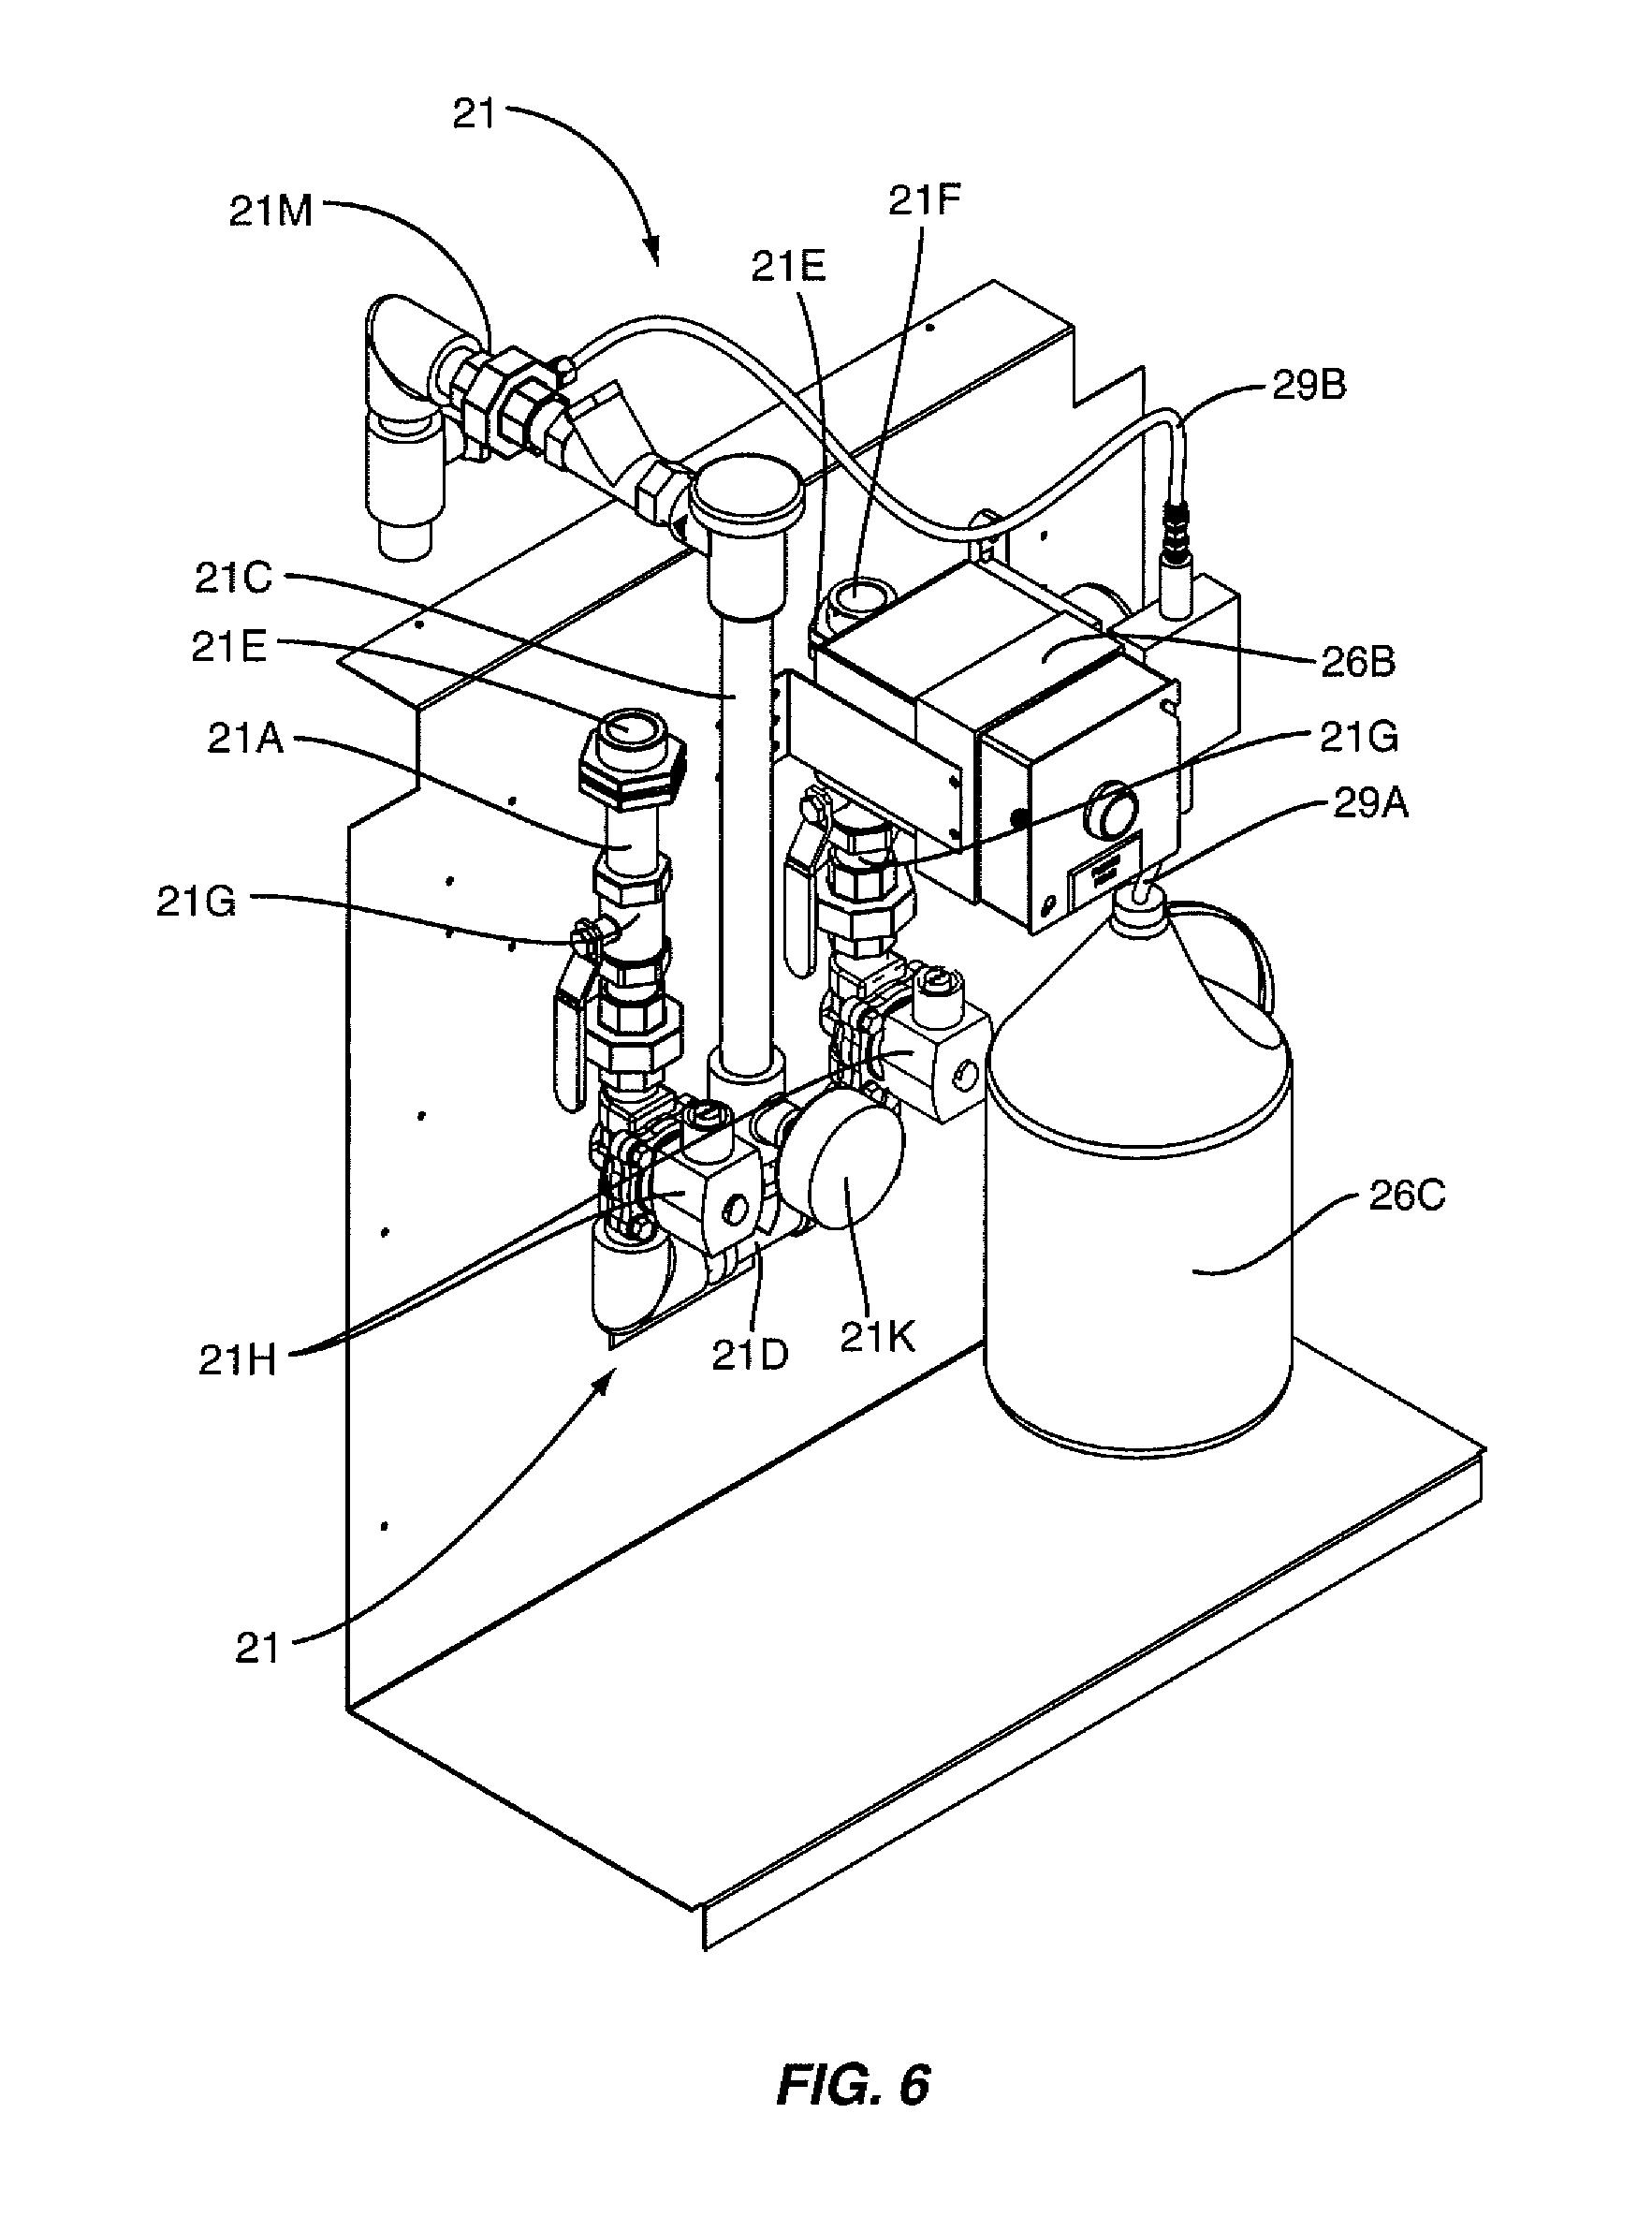 US08378834 20130219 D00007?resize=665%2C898 ansul automan wiring diagram ansul schematics, mac valve 9 pin ansul system wiring schematic at nearapp.co